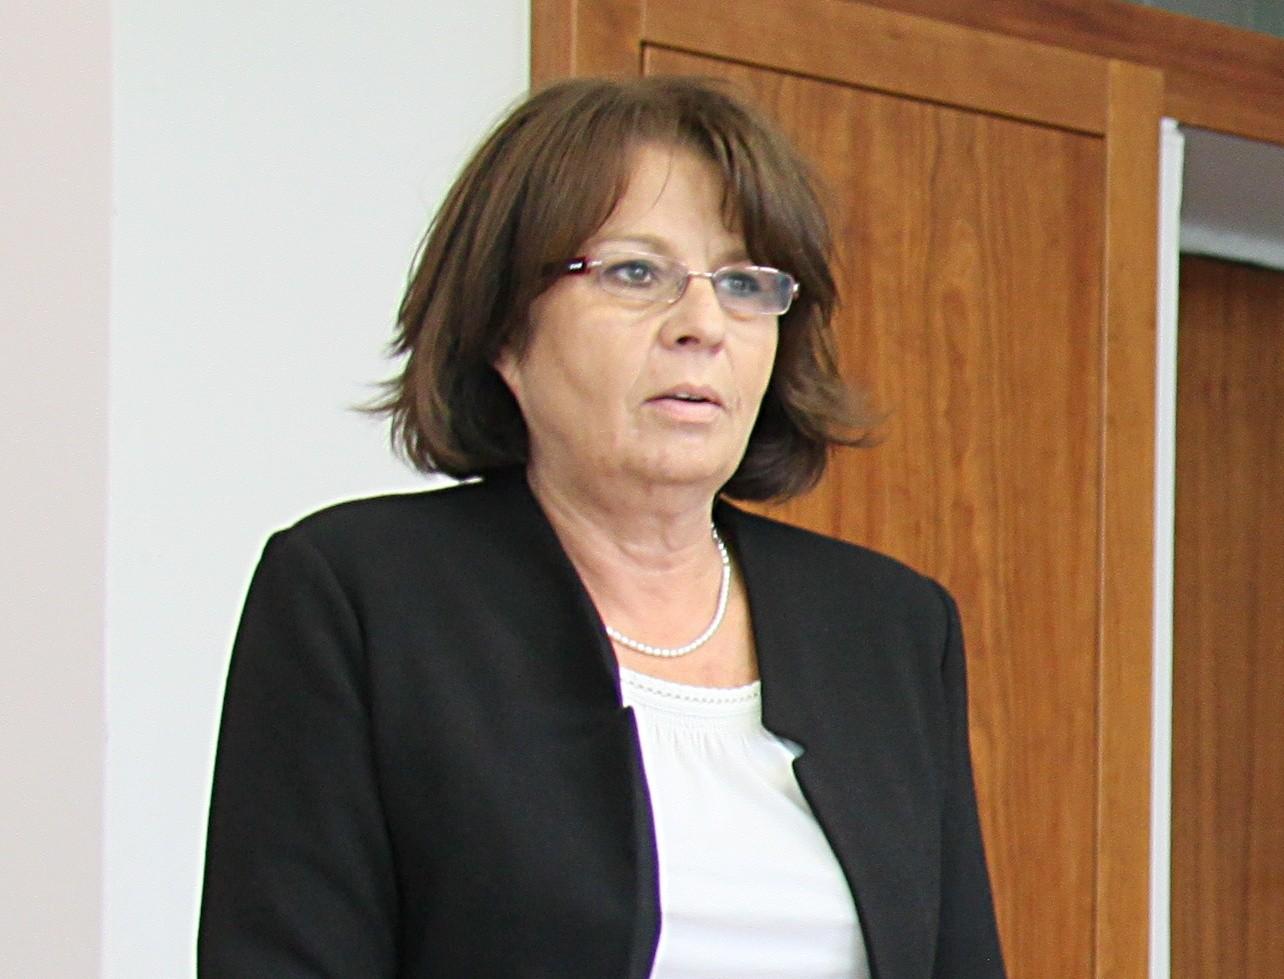 Alena Češková